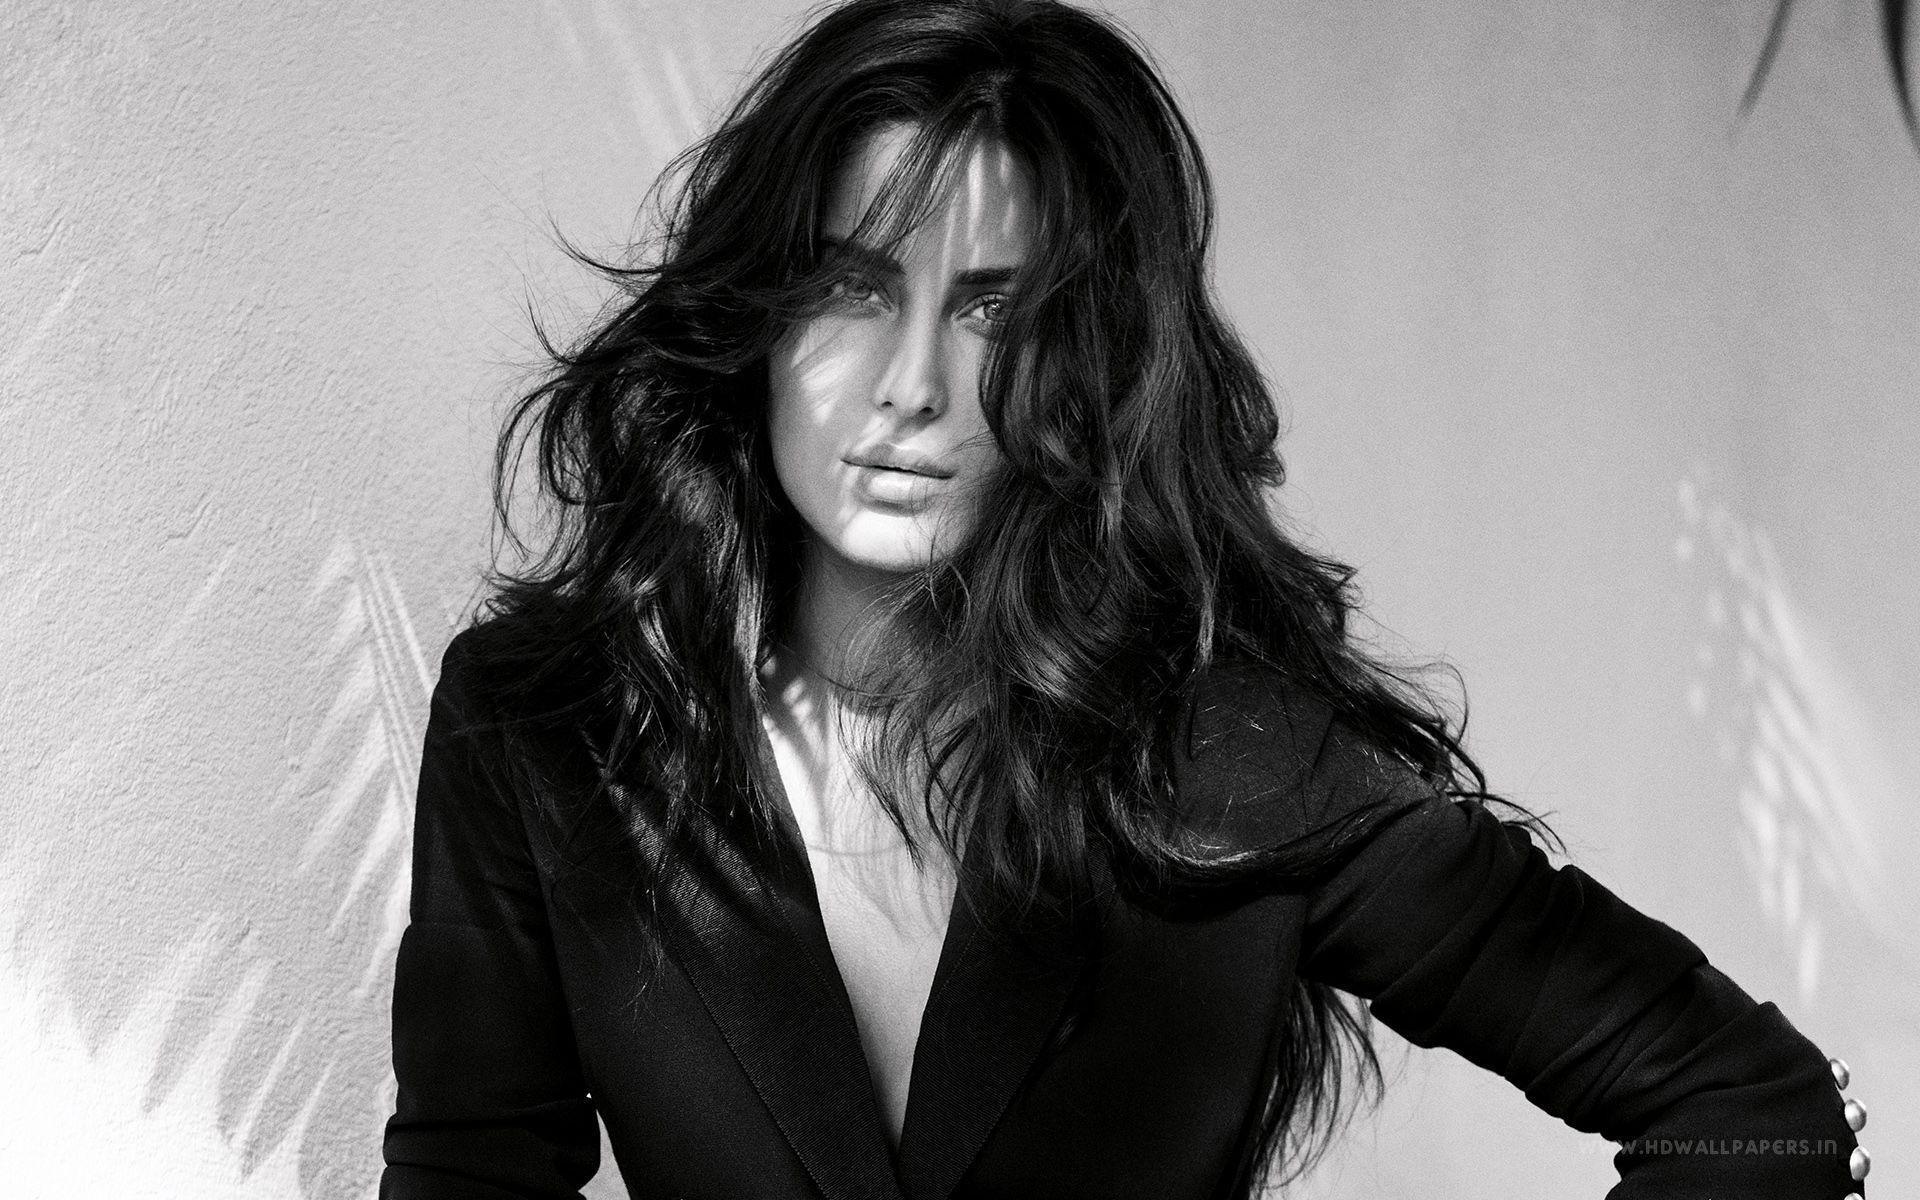 Katrina Kaif GQ Cover Wallpapers | HD Wallpapers